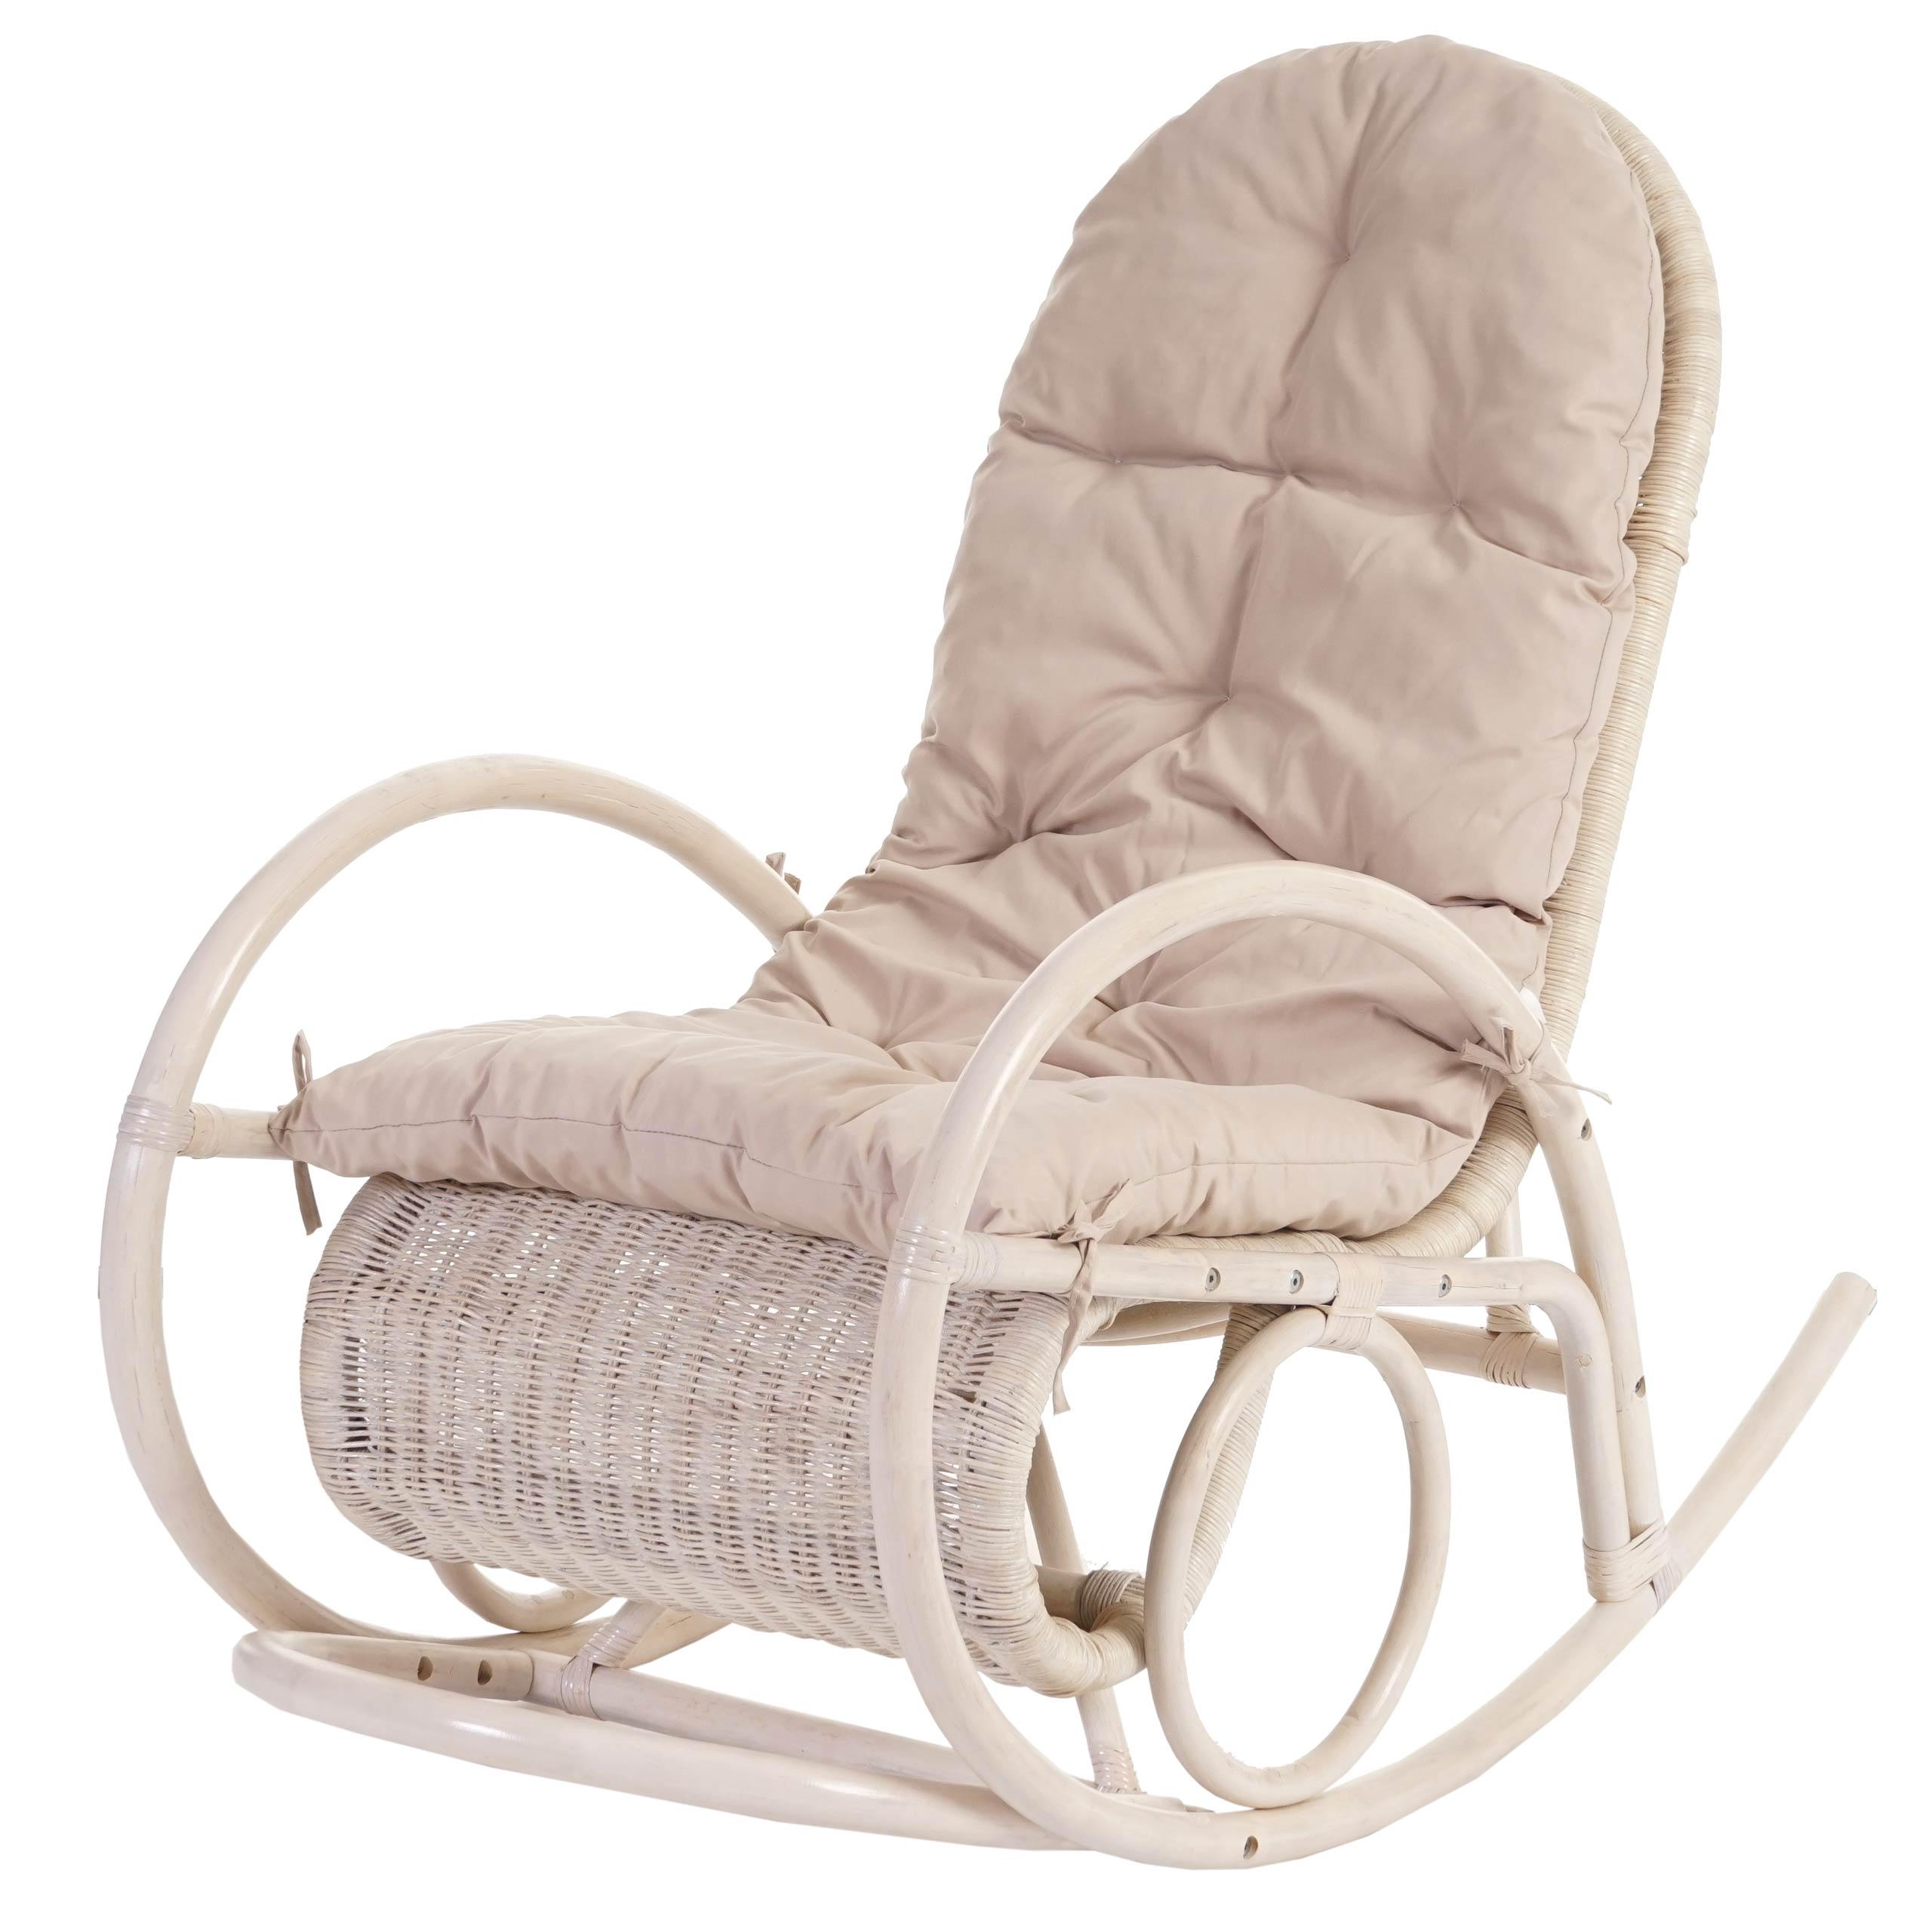 Sedia a dondolo esmeraldas legno rattan 115x58x101cm - Ikea sedie a dondolo ...